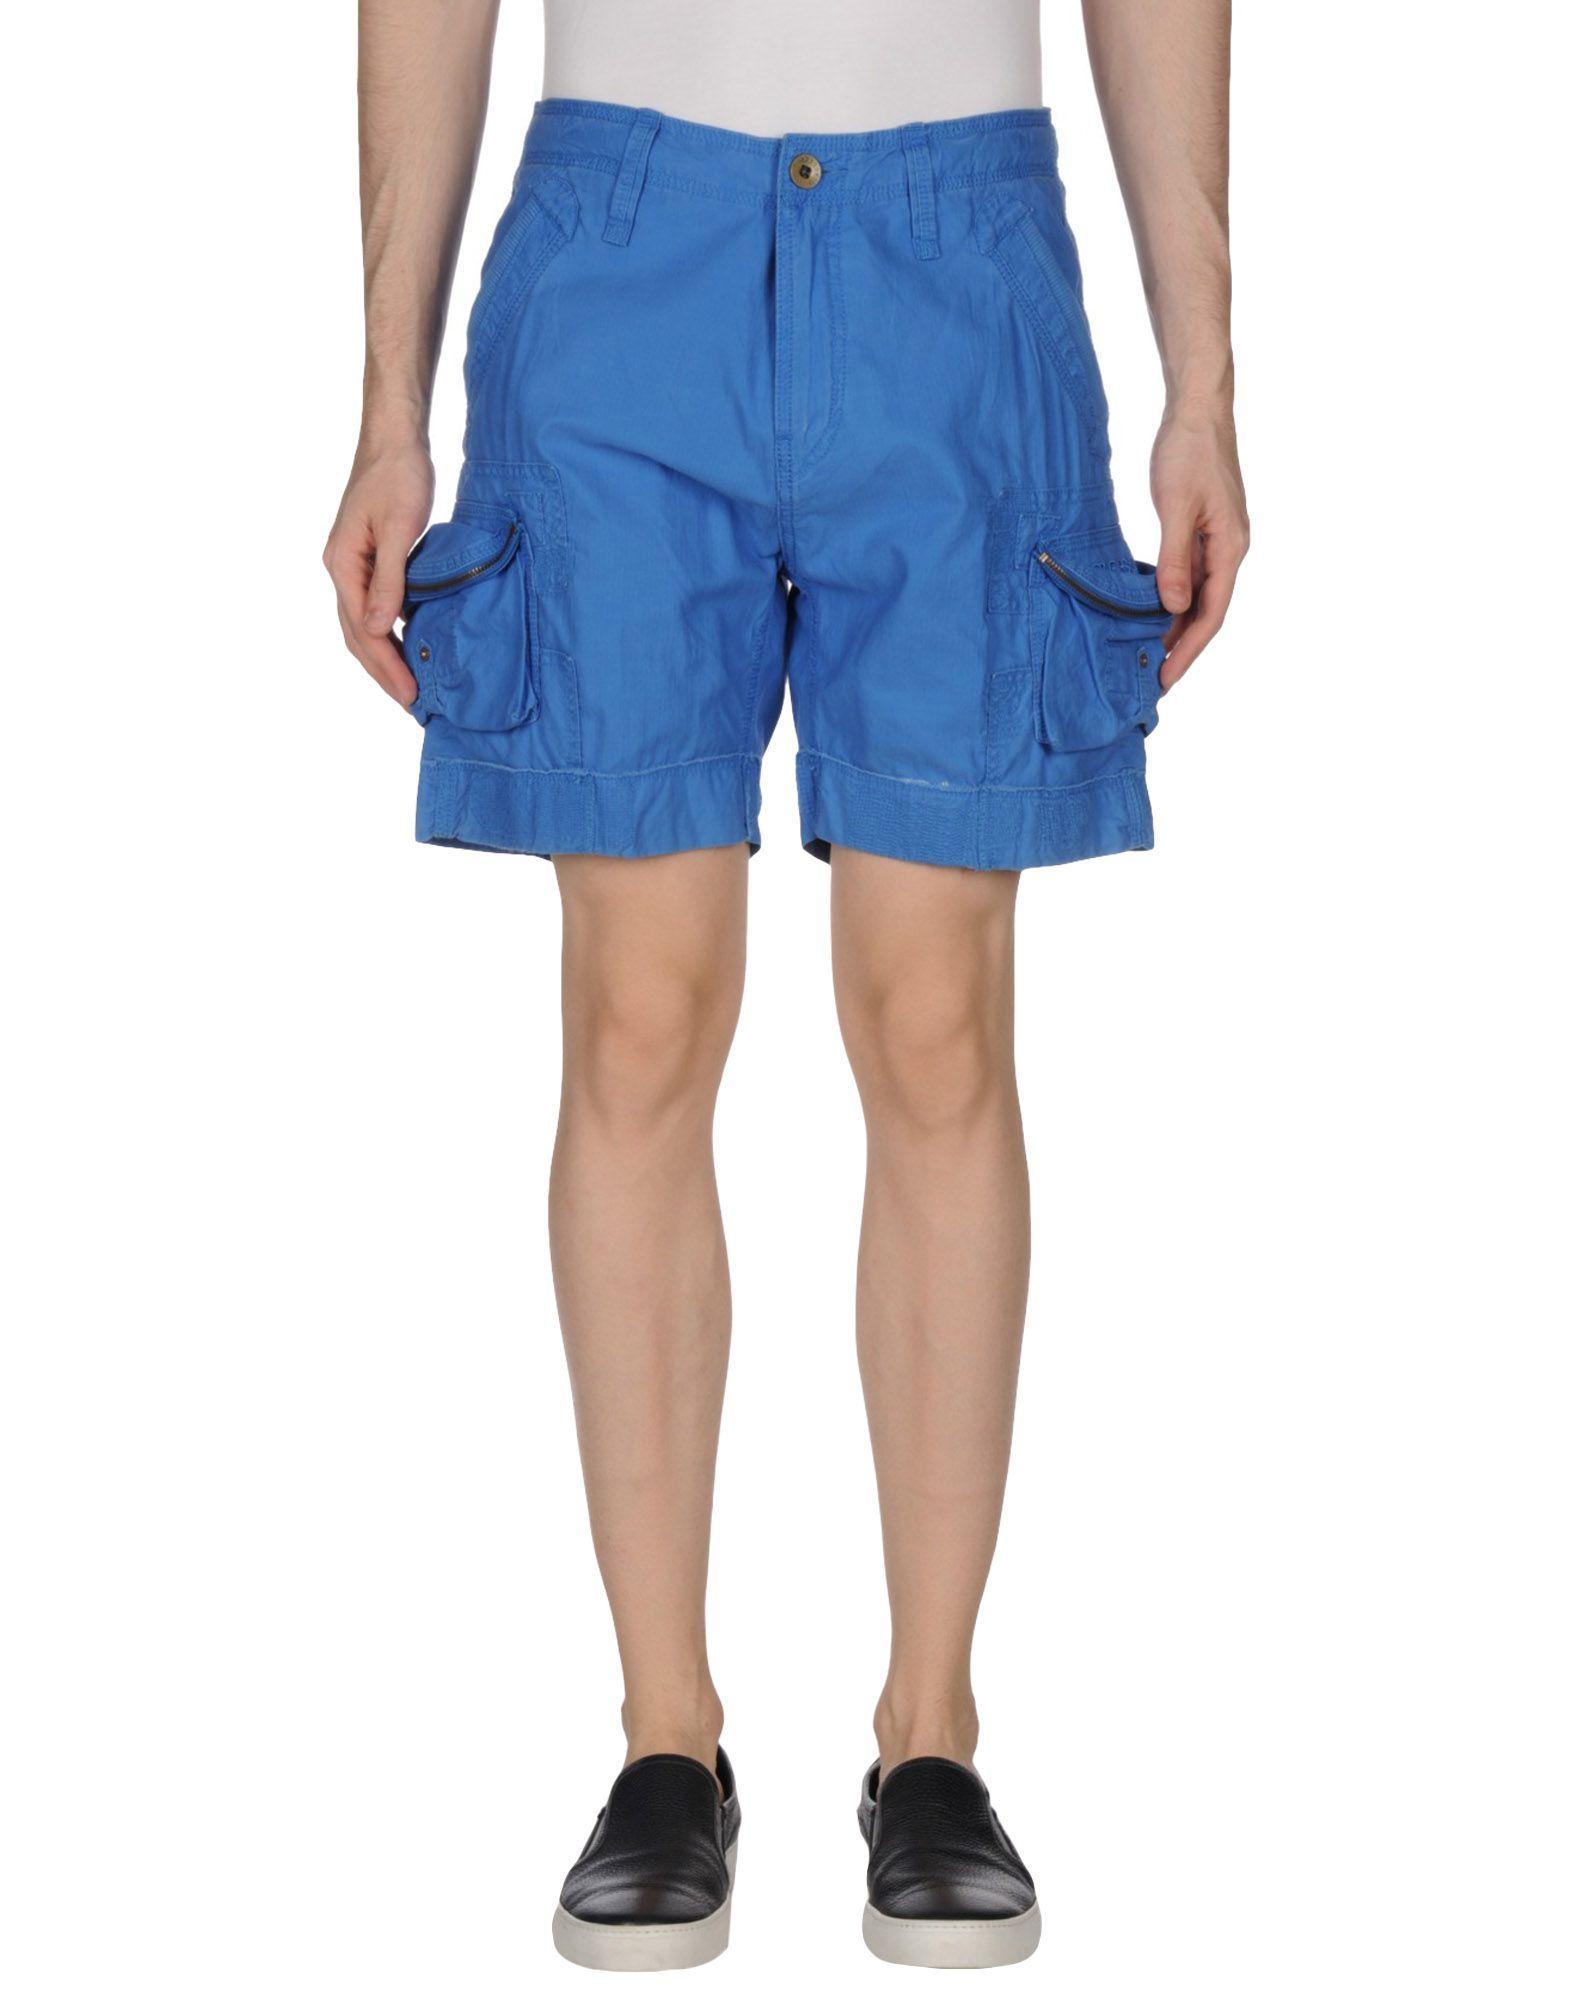 TROUSERS - Bermuda shorts Freesoul Shop Your Own GzpyC